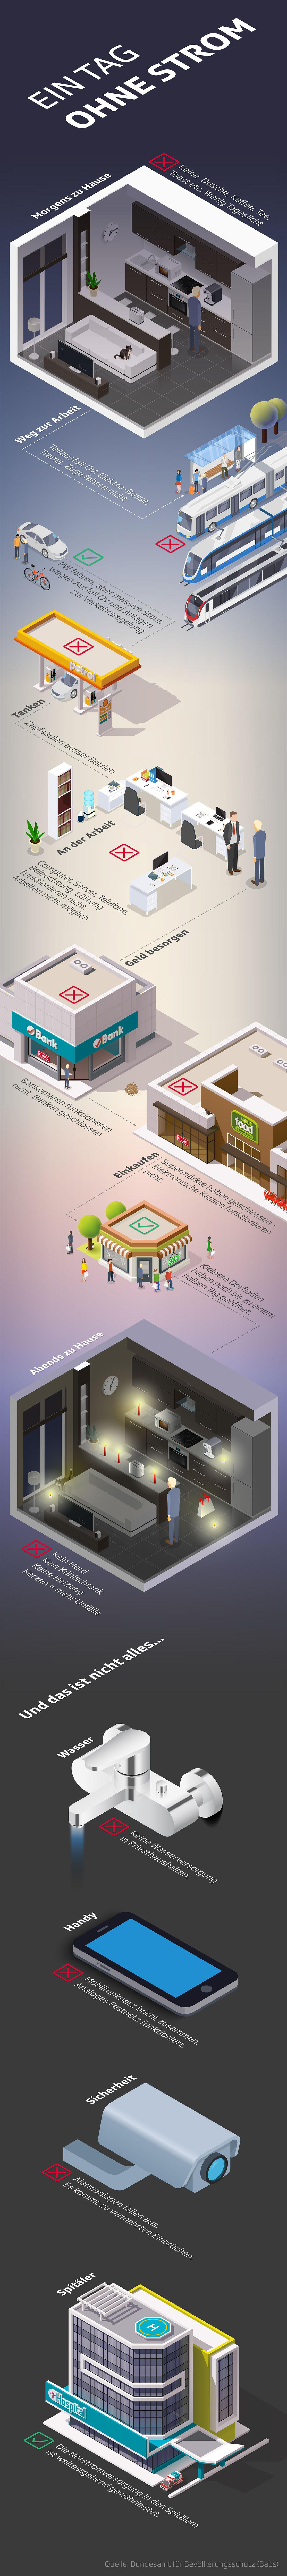 Infografik: Ein Tag ohne Strom